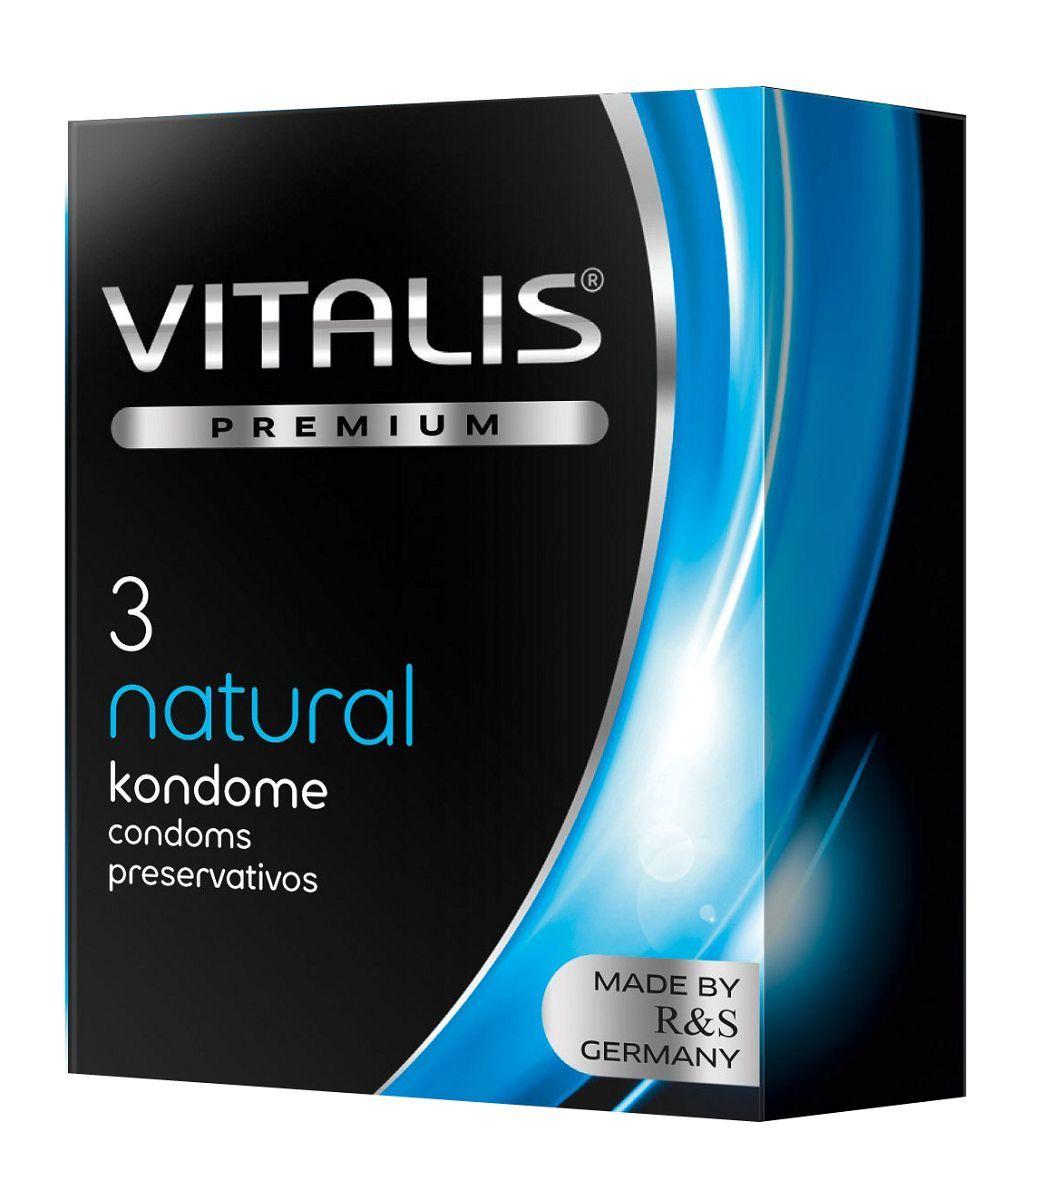 Классические презервативы VITALIS PREMIUM natural - 3 шт.